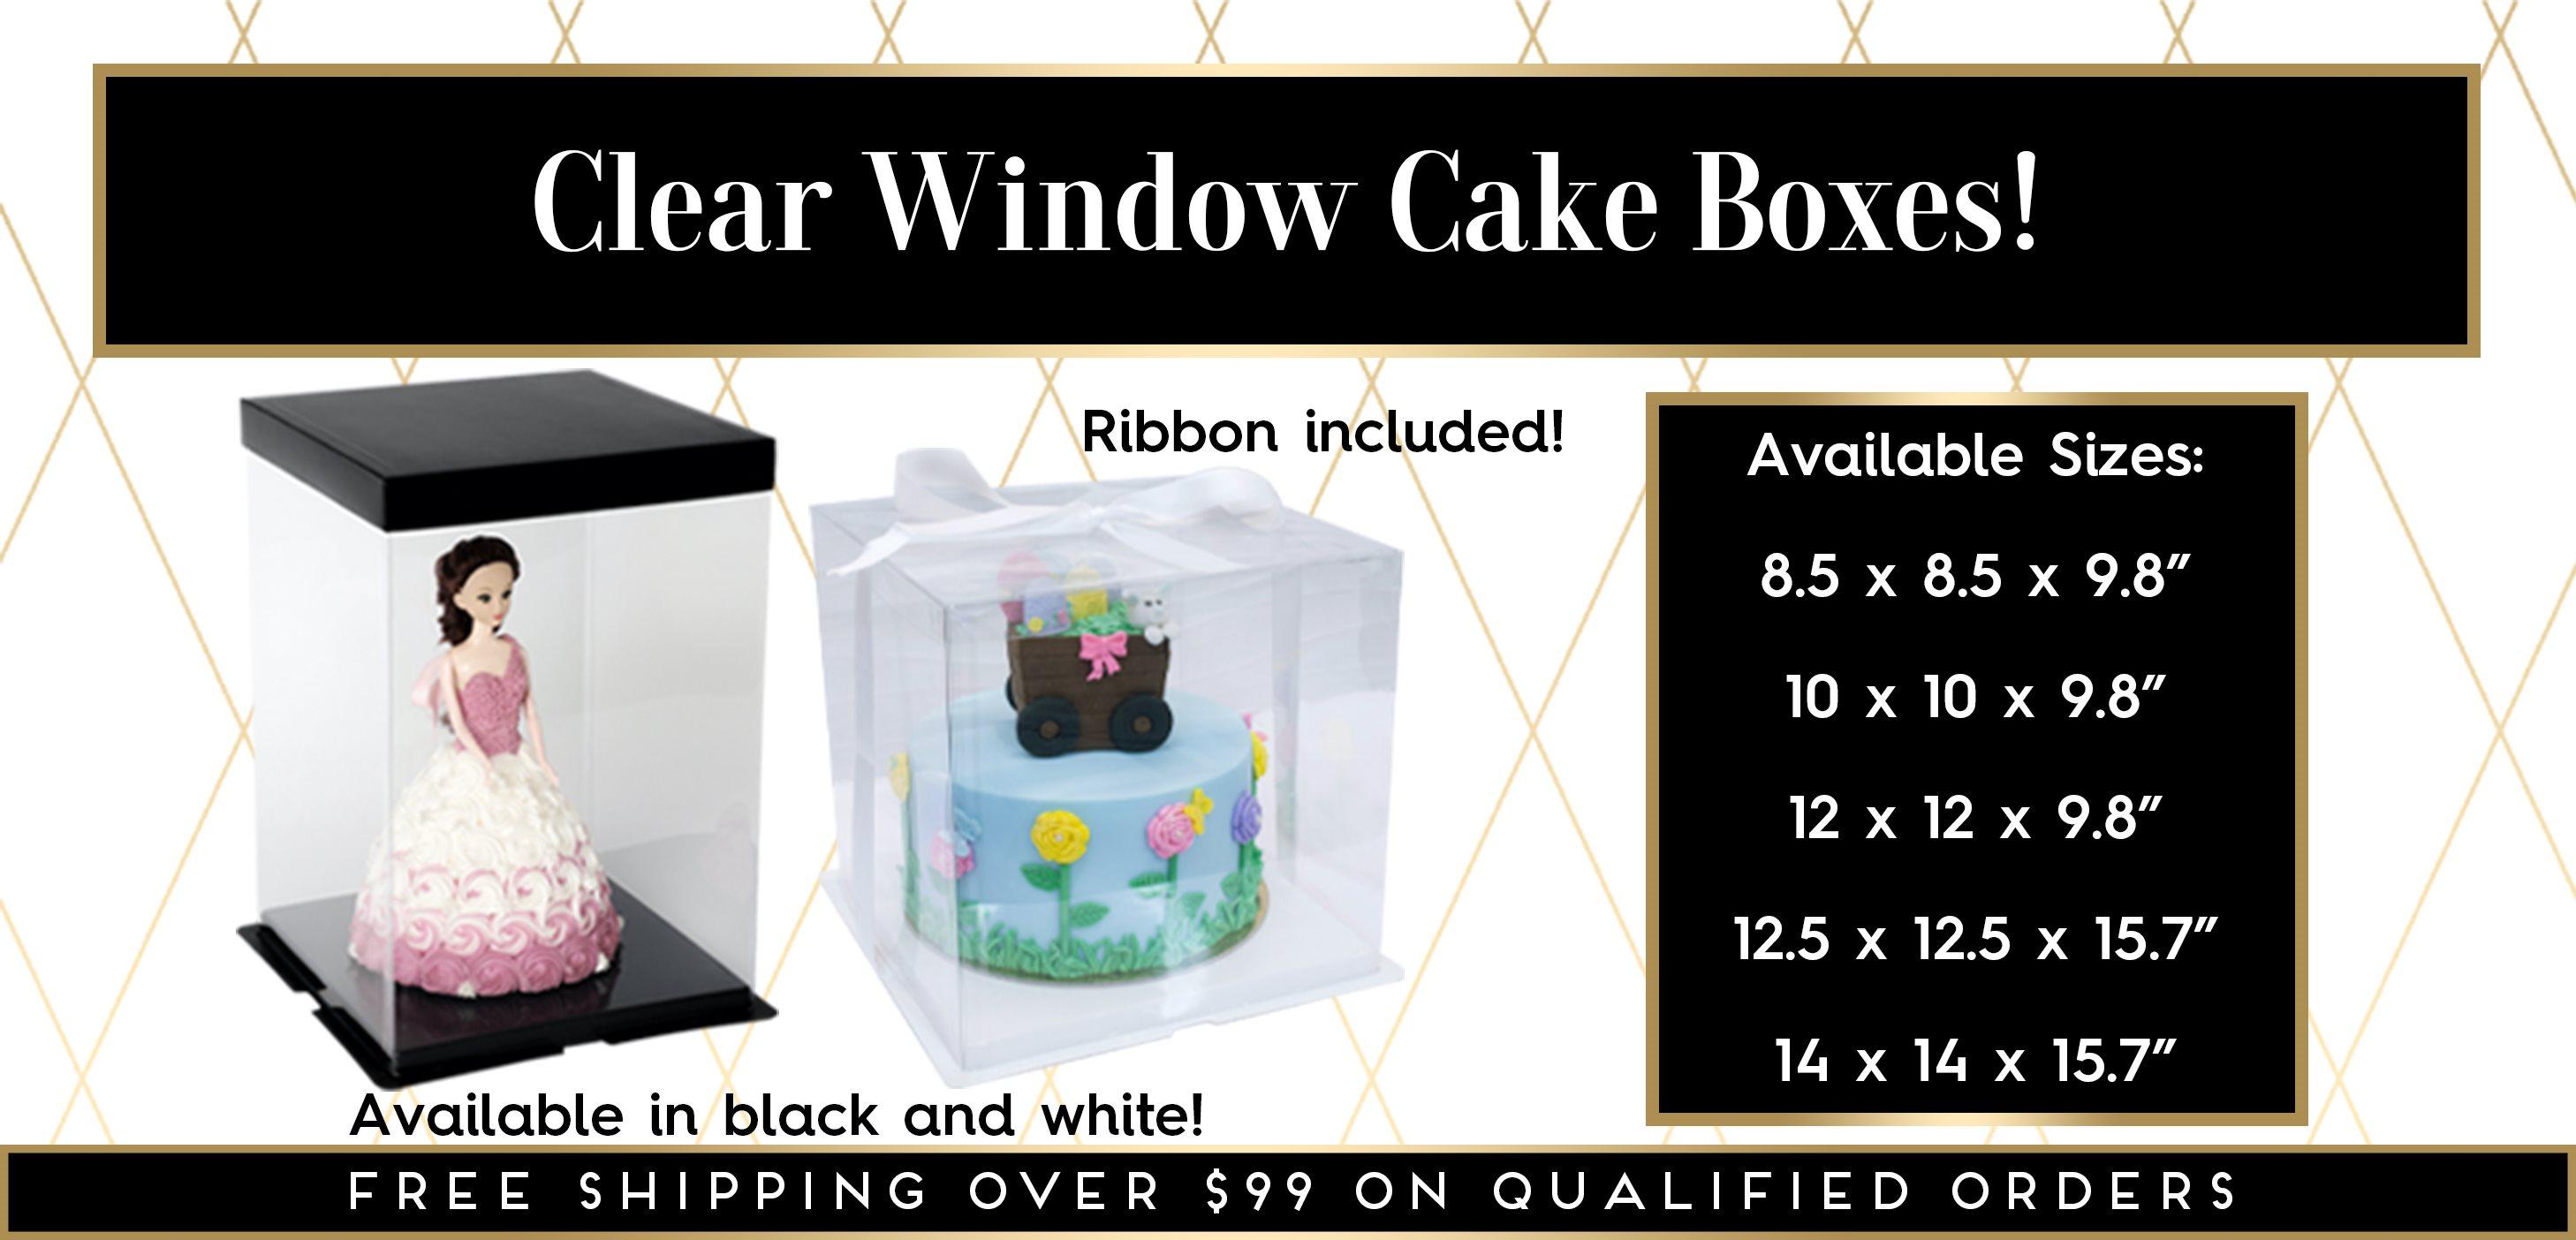 Clear Window Cake Boxes Black White Base